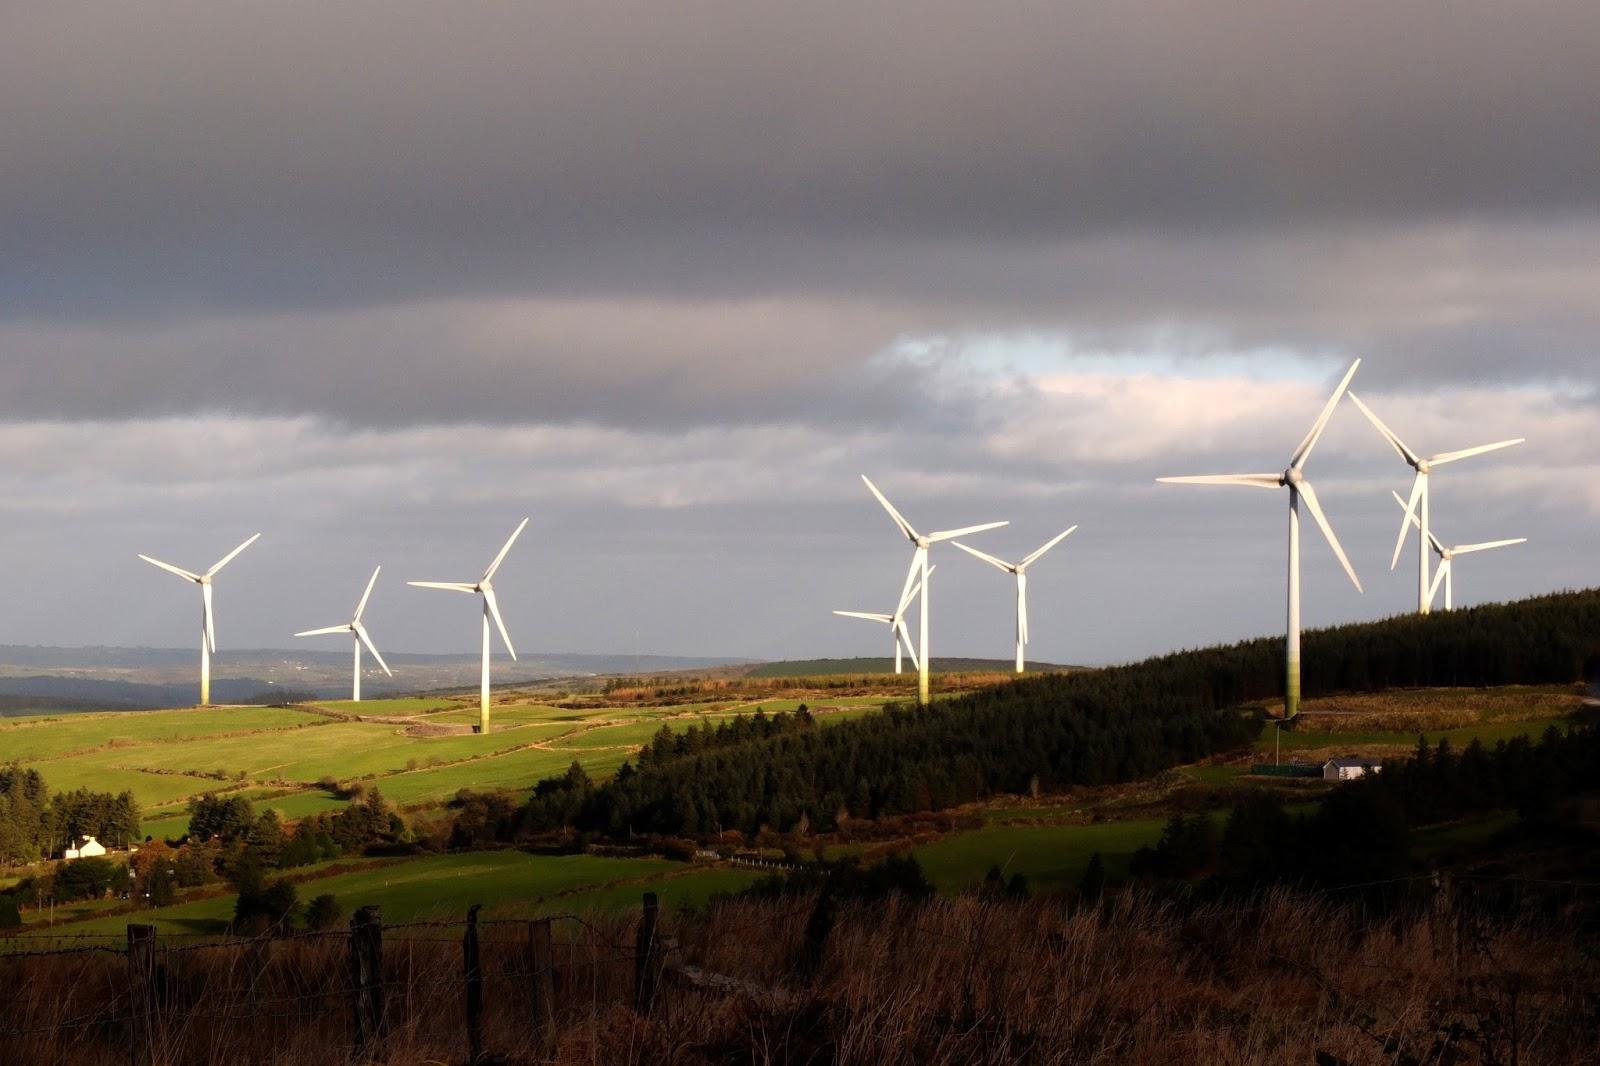 A dramatic Irish mountain landscape with a wind turbine farm.